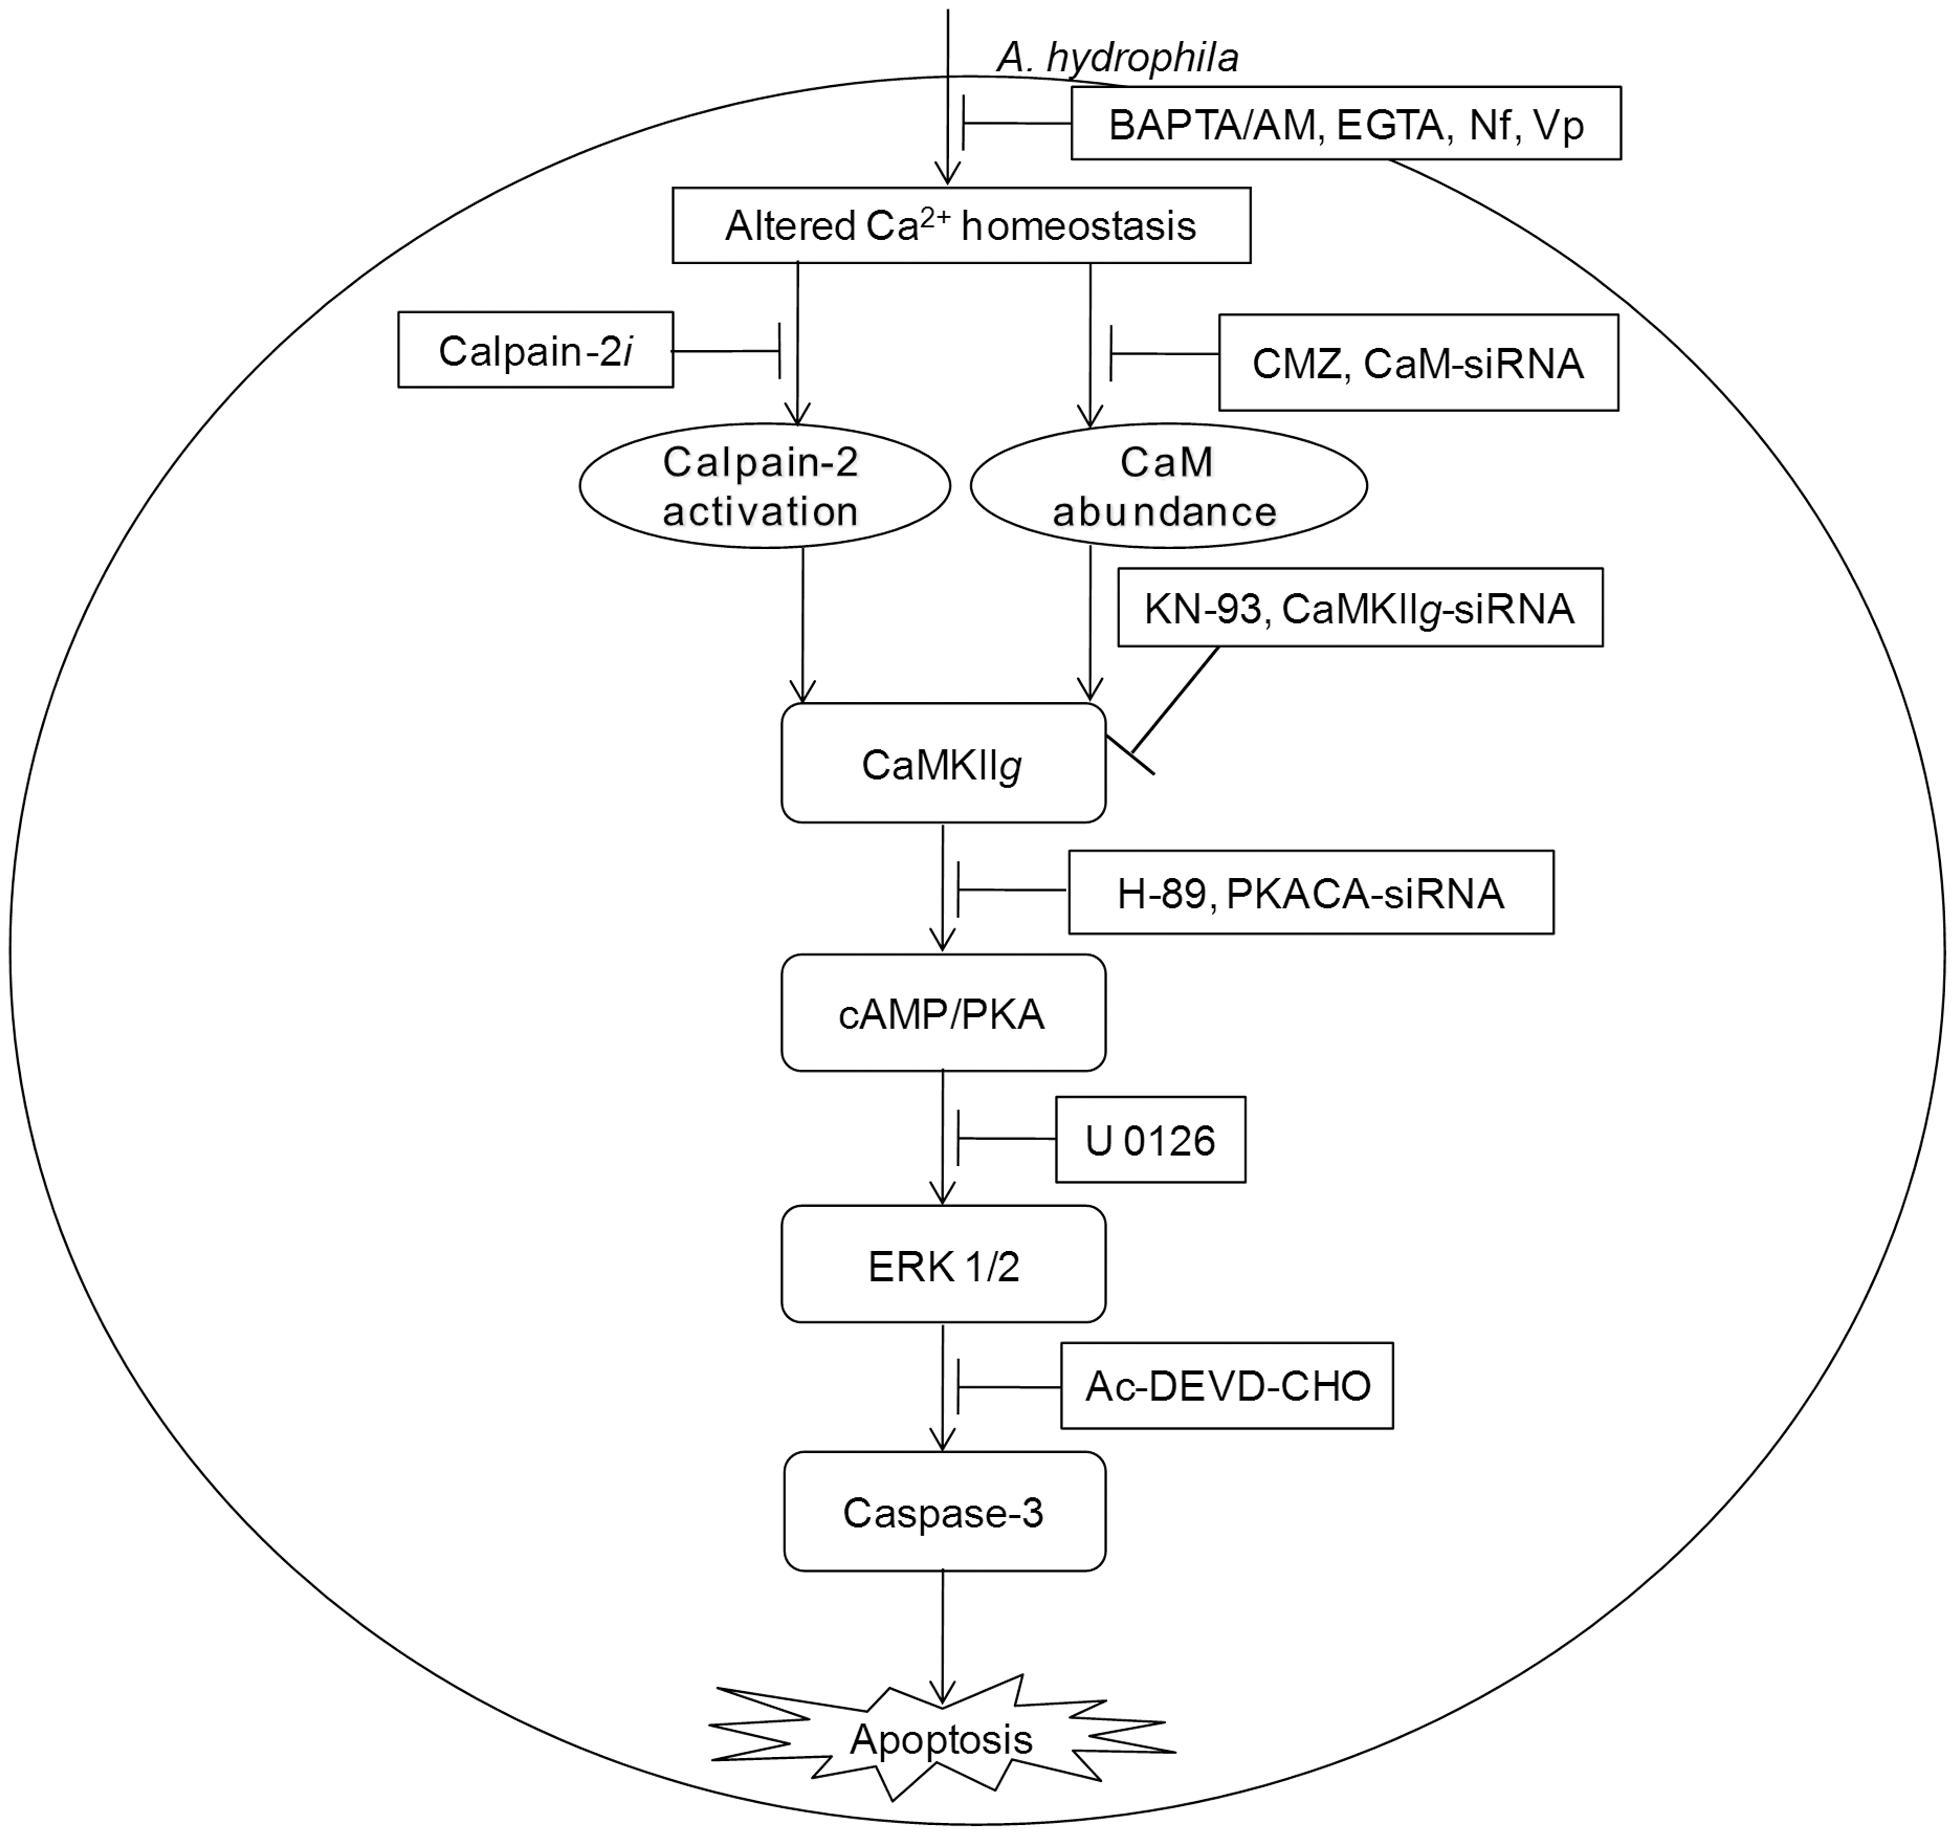 CaM-CaMKII-cAMP/PKA-ERK 1/2 axis leads to caspase-3 mediated apoptosis of <i>A. hydrophila</i>-infected HKM.